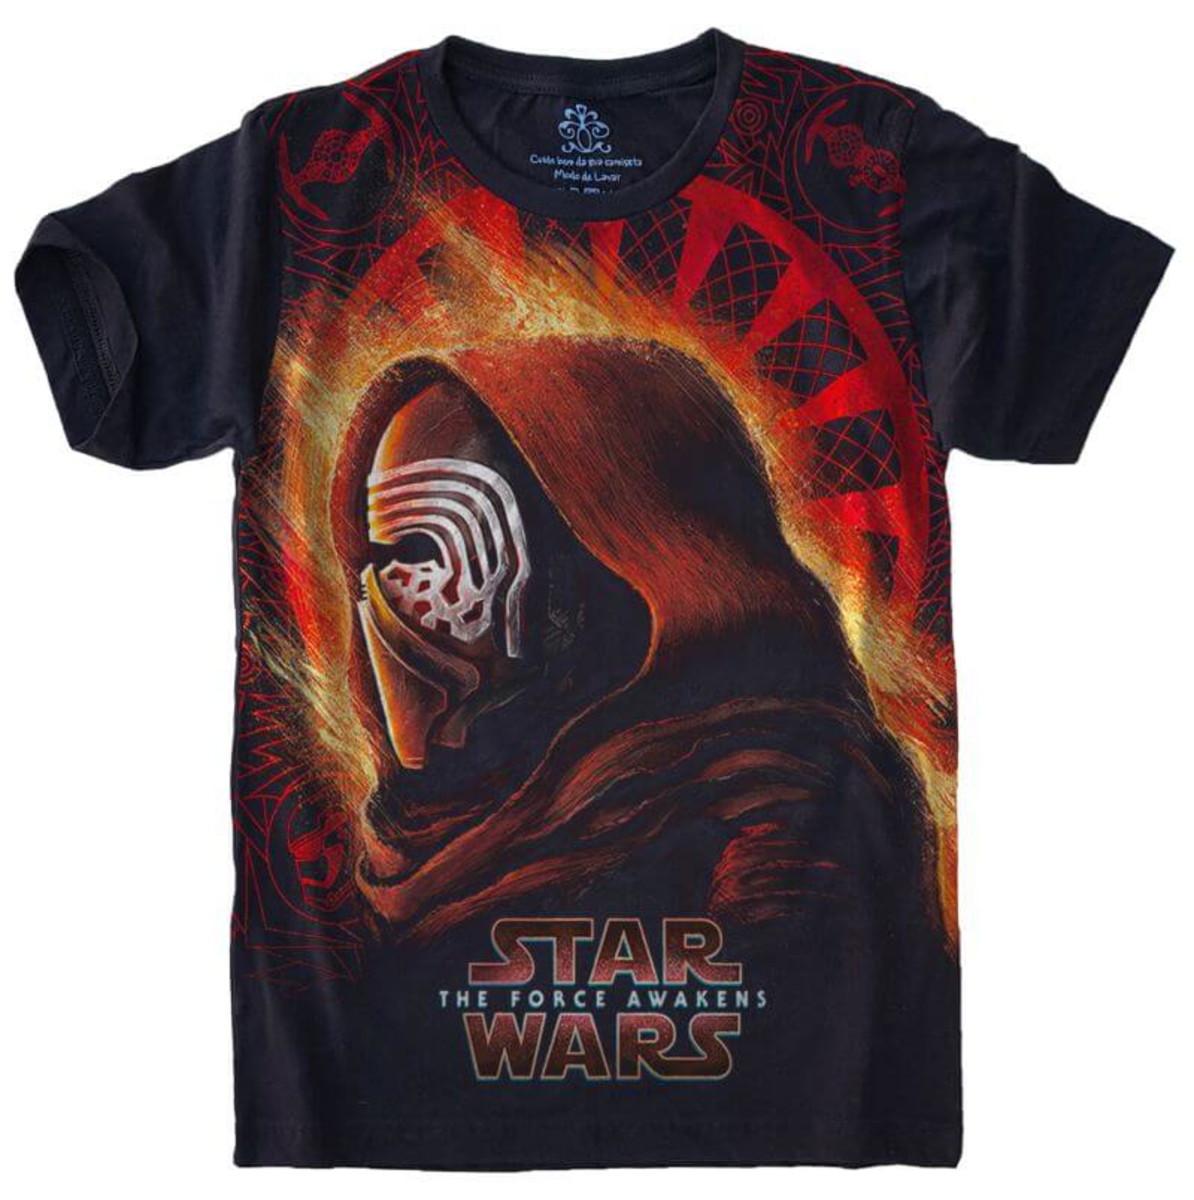 bbe39eb397 Camiseta Star Wars no Elo7